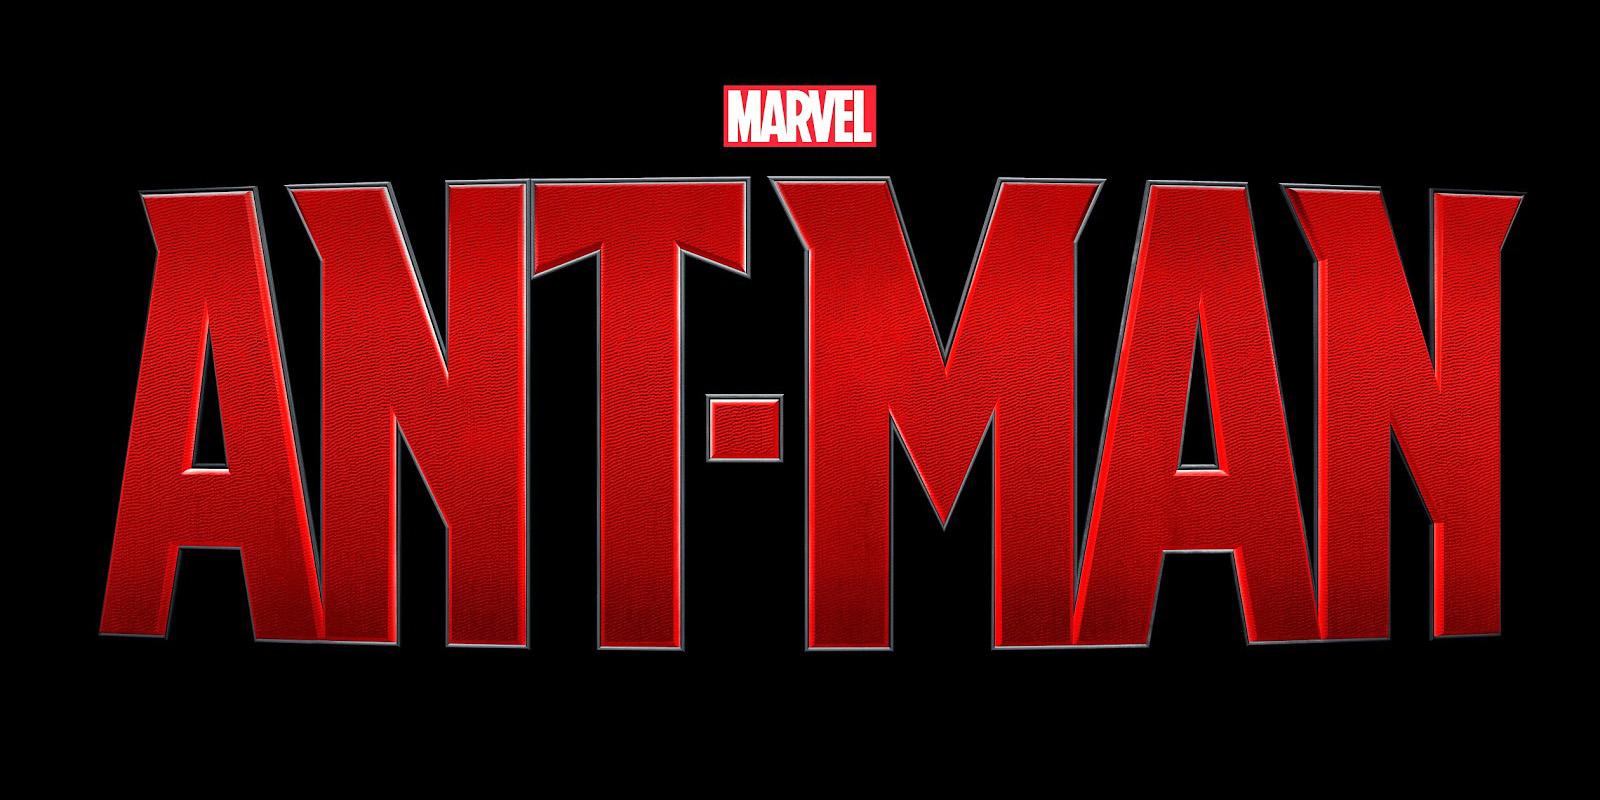 Marvel-Ant-Man-Logo-Textured.jpg